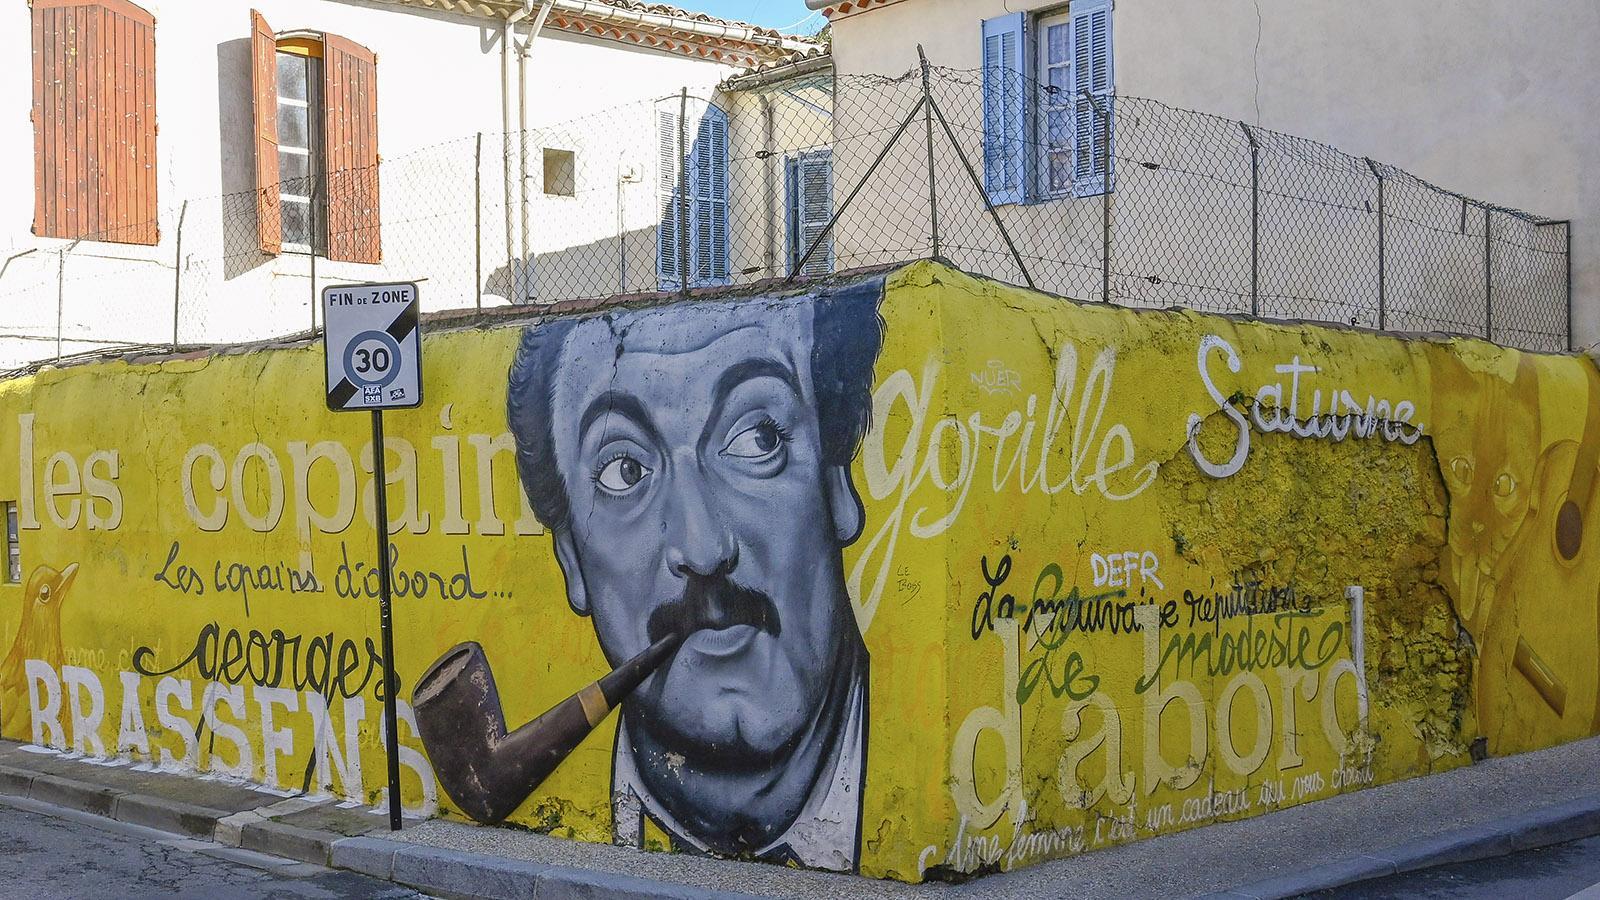 Les Copains d'abord: Georges Brassens in Richelieu. Foto: Hilke Maunder